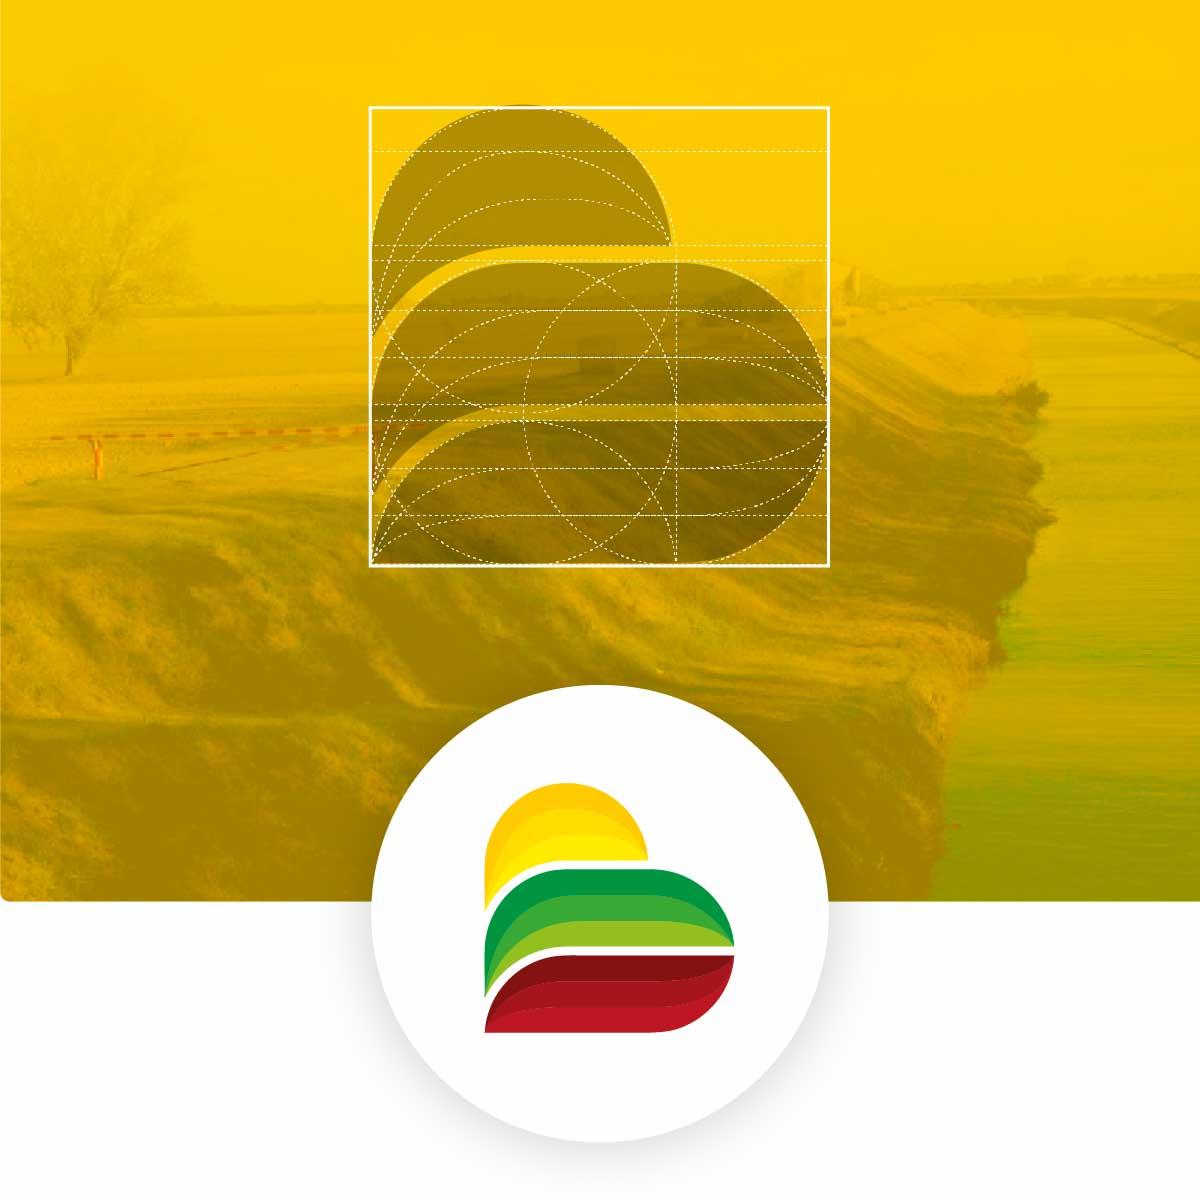 bassa romagna mia portale turismo branding logo 1